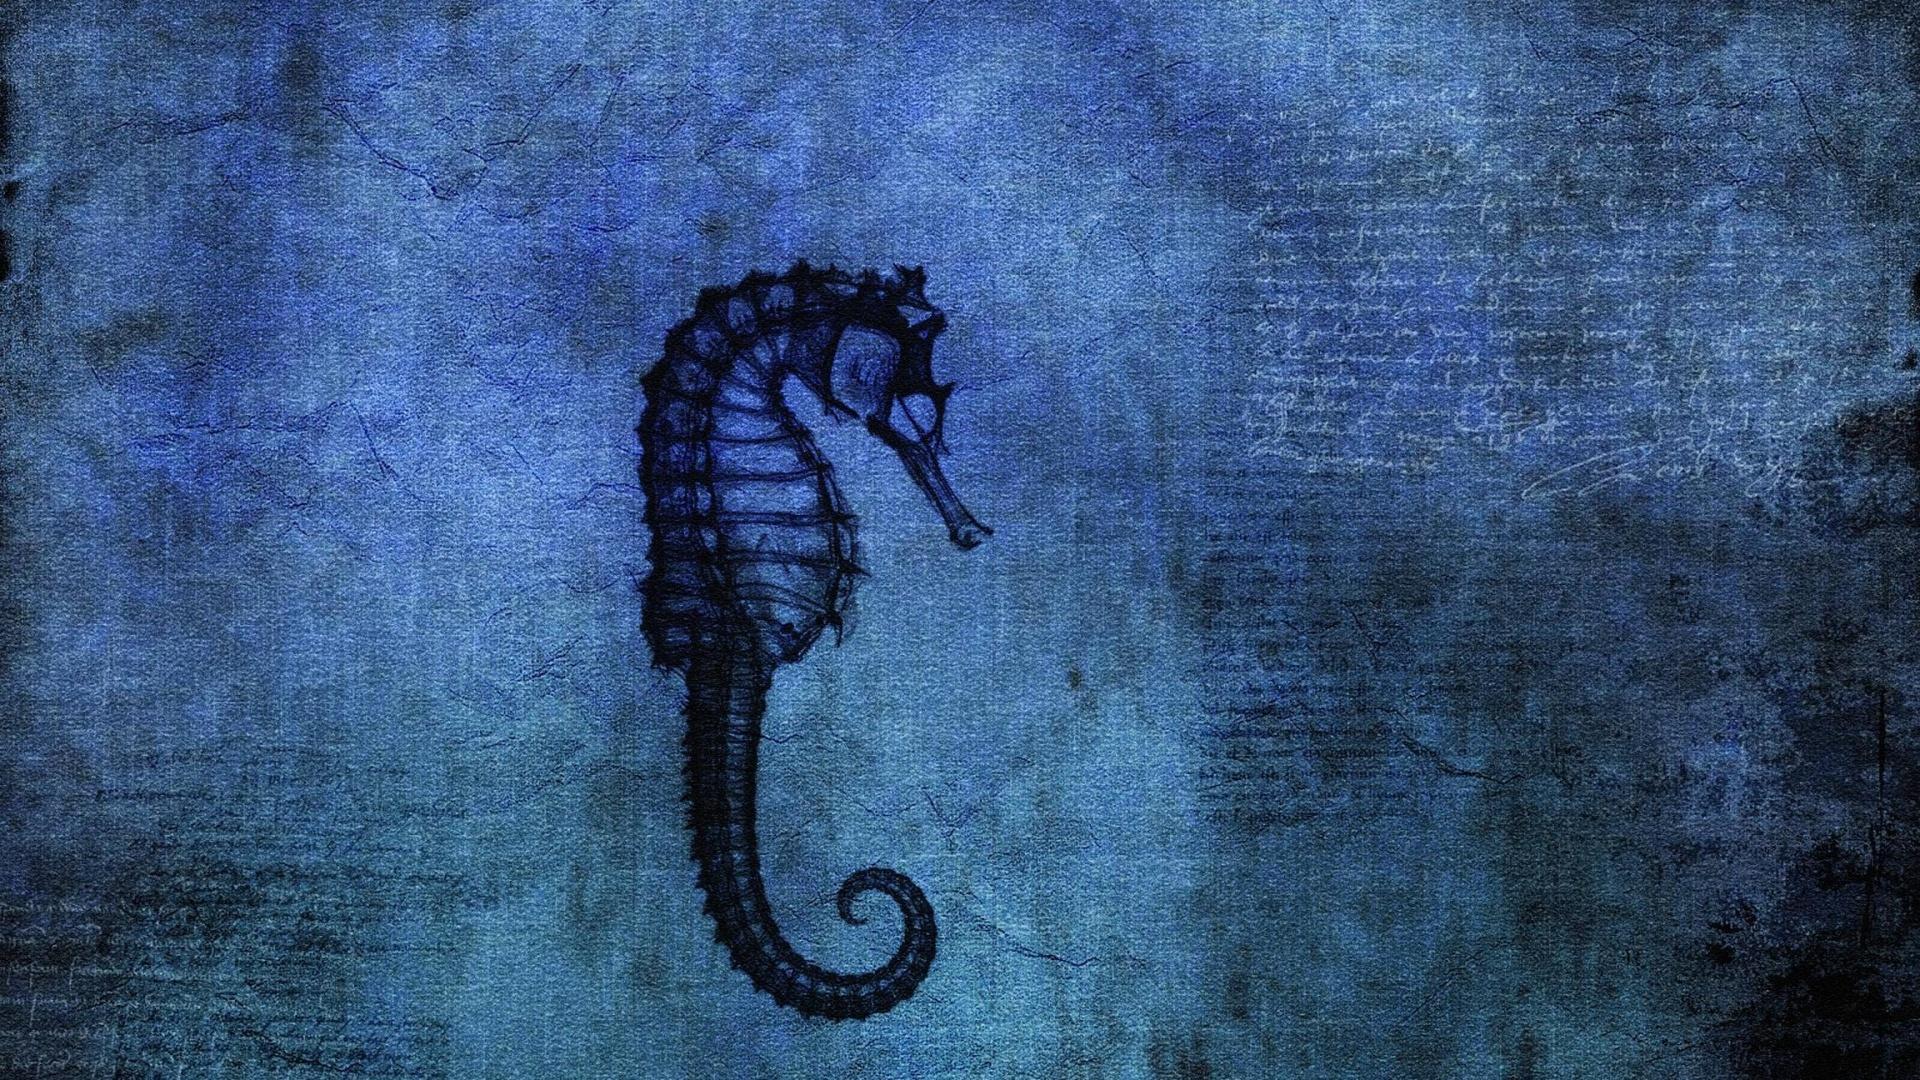 Seahorse Wallpaper theme